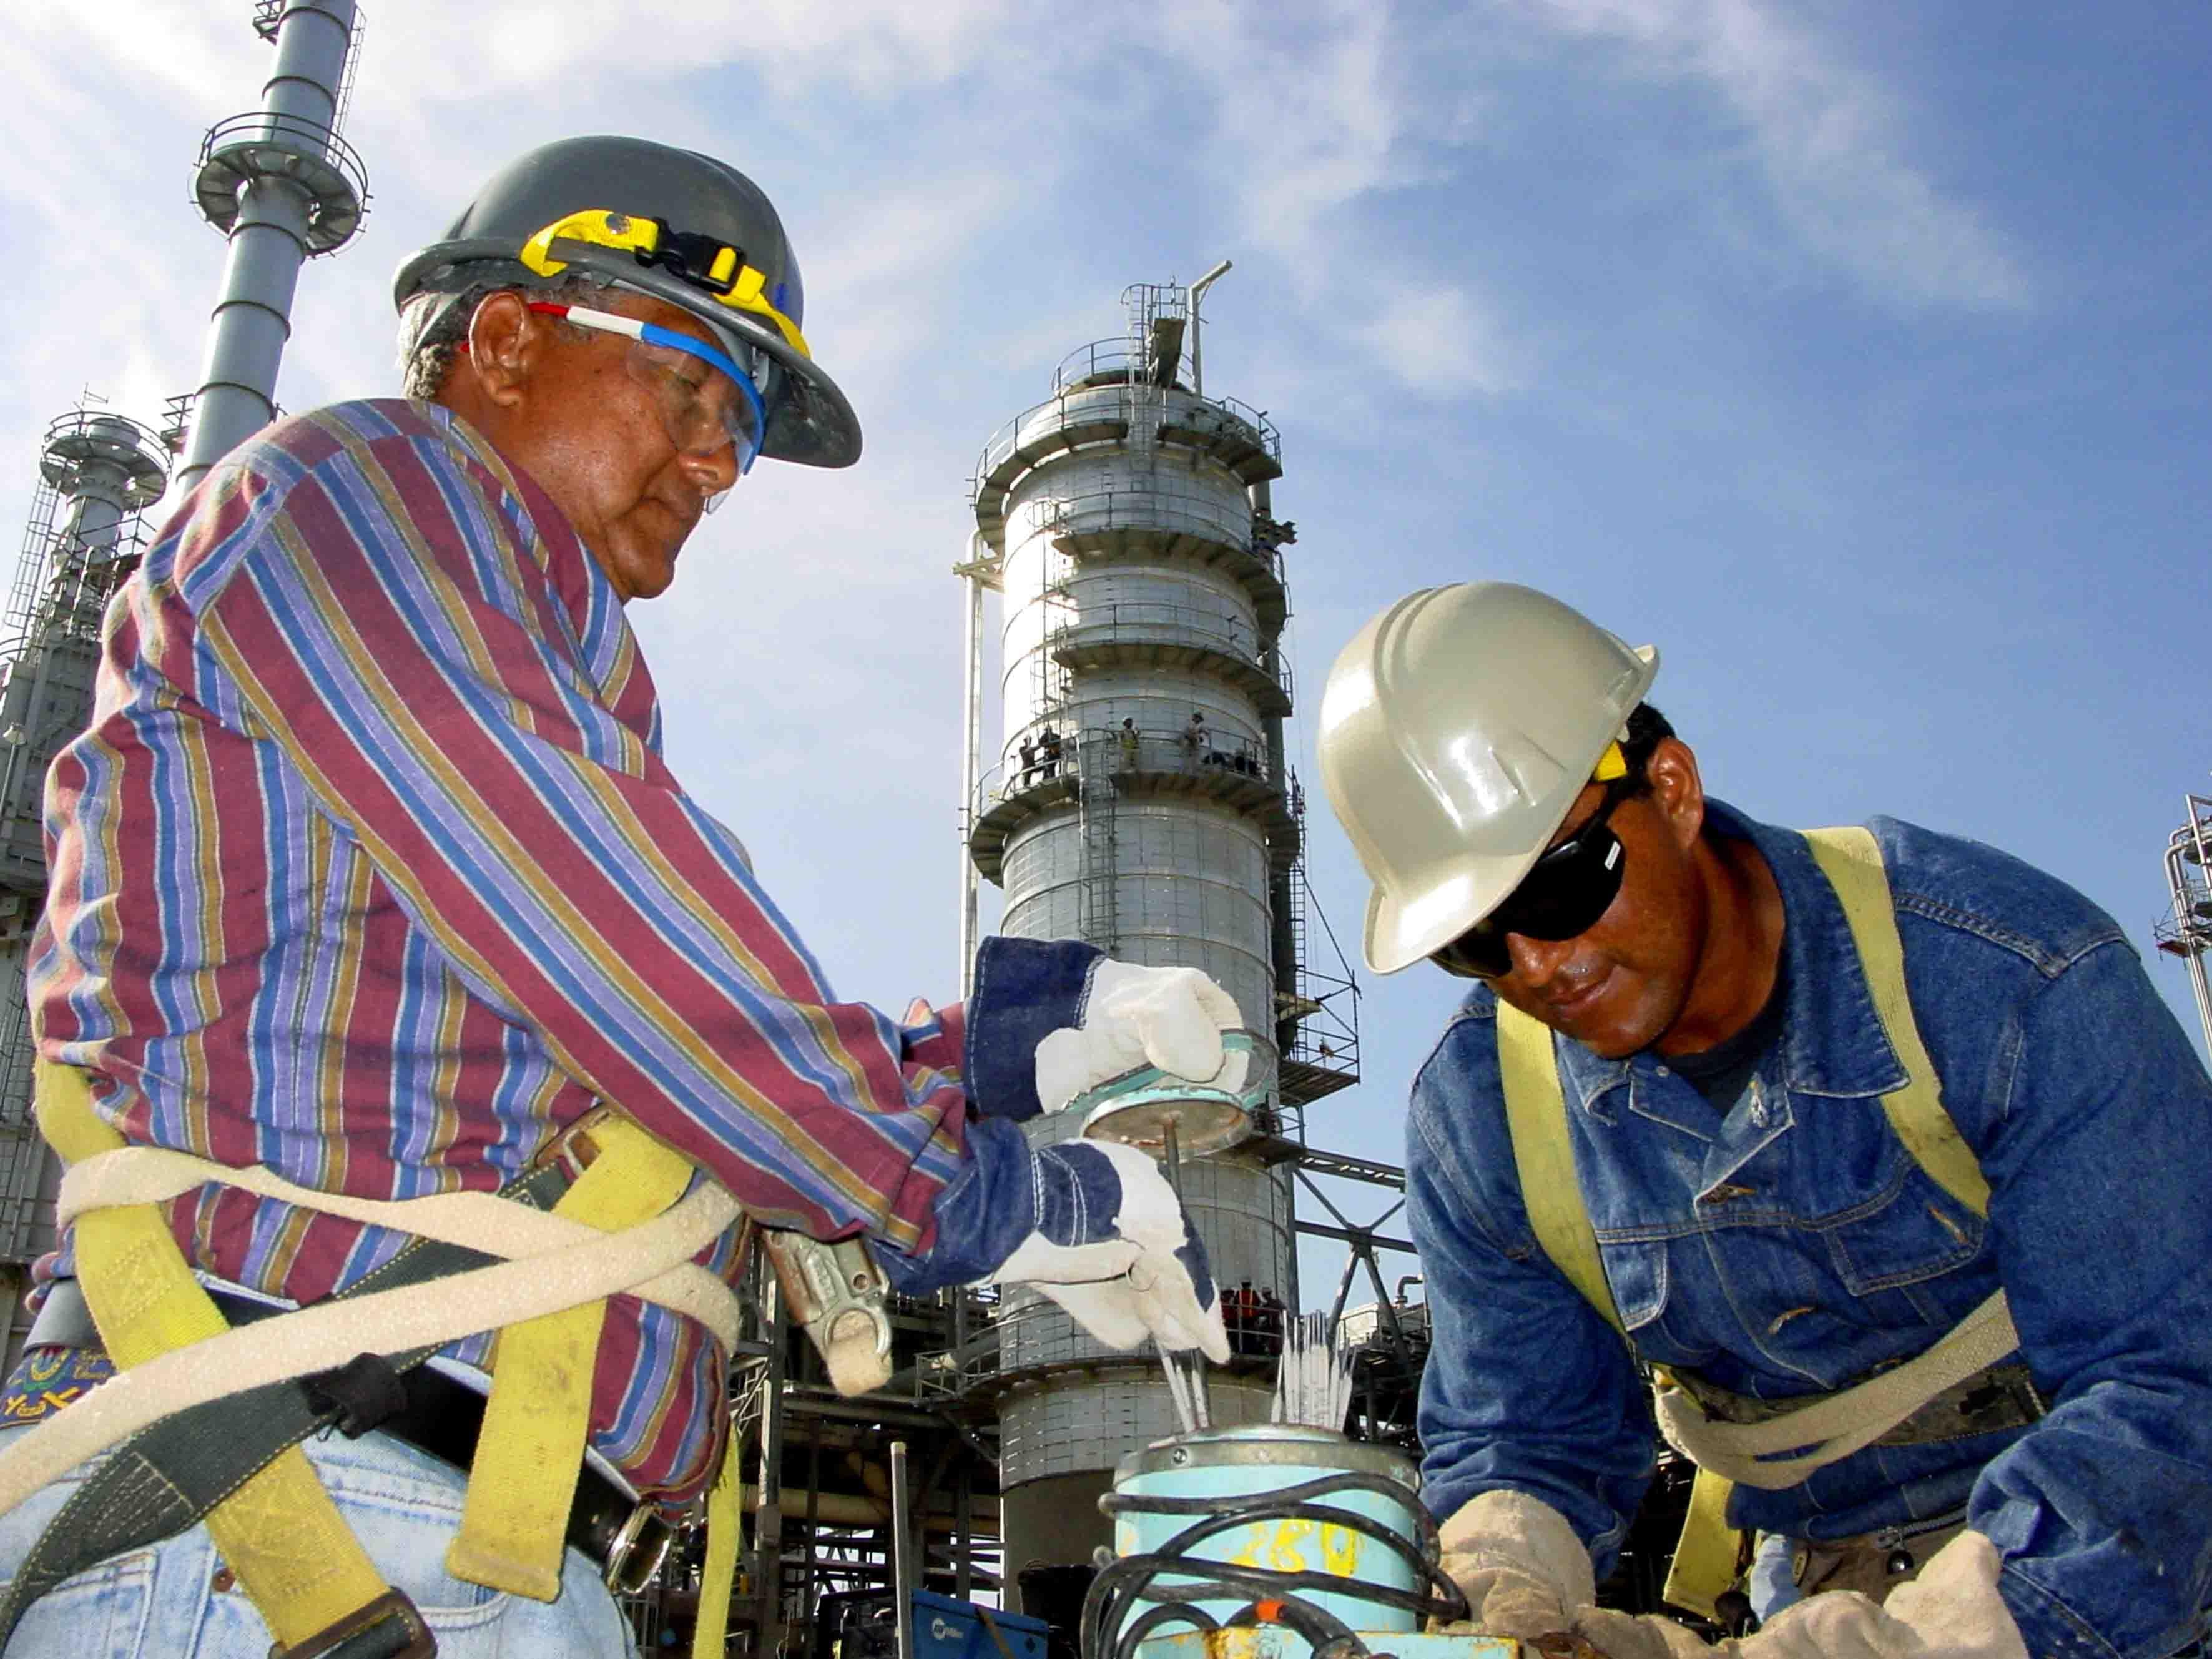 Romero Deschamps es reelecto como líder petrolero